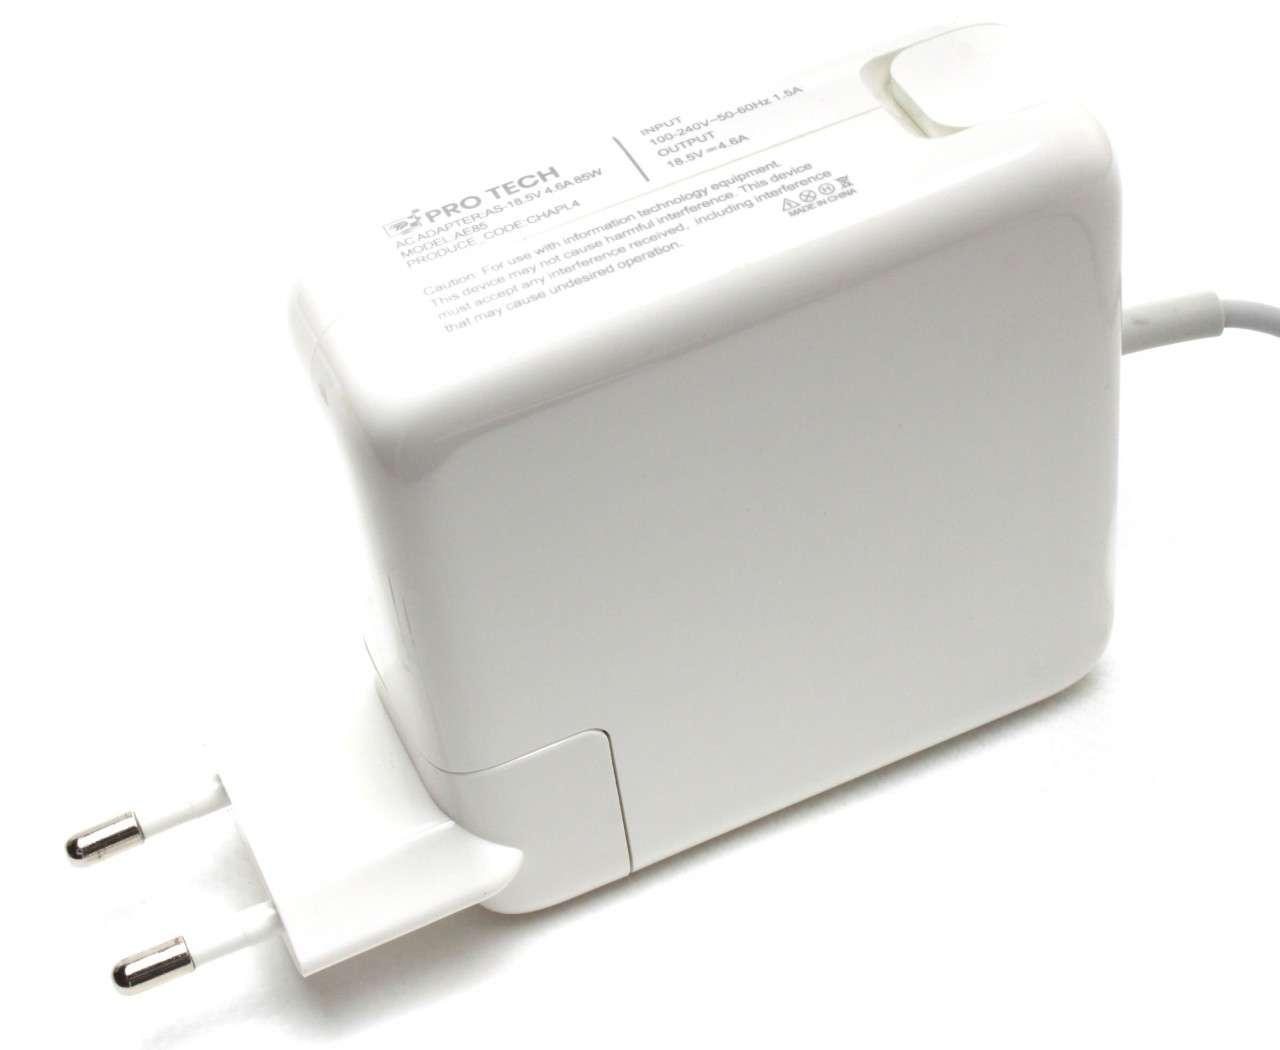 Incarcator Apple MacBook Pro 17 inch Late 2011 85W Replacement imagine powerlaptop.ro 2021